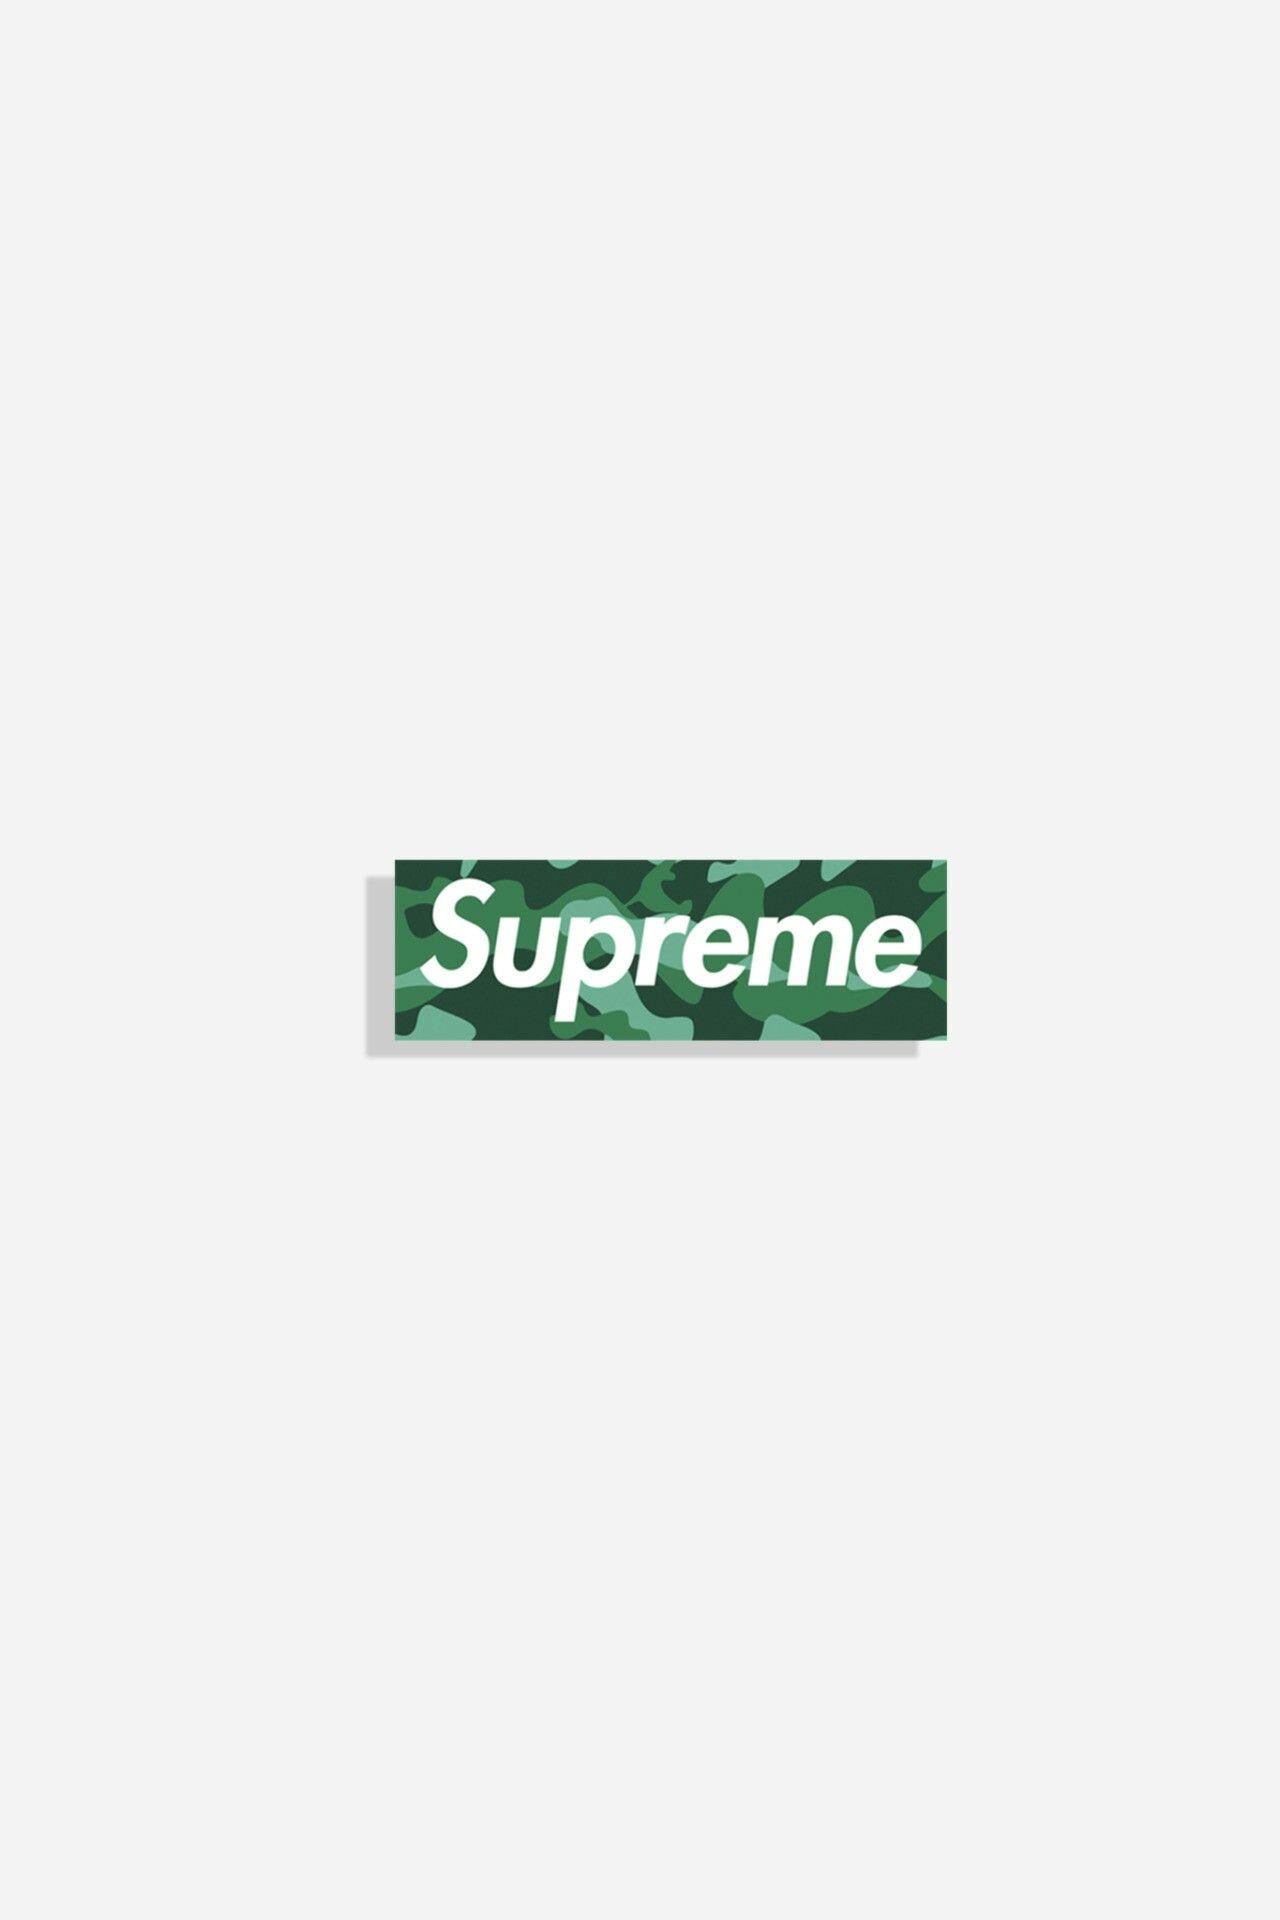 supreme logo background wwwpixsharkcom images